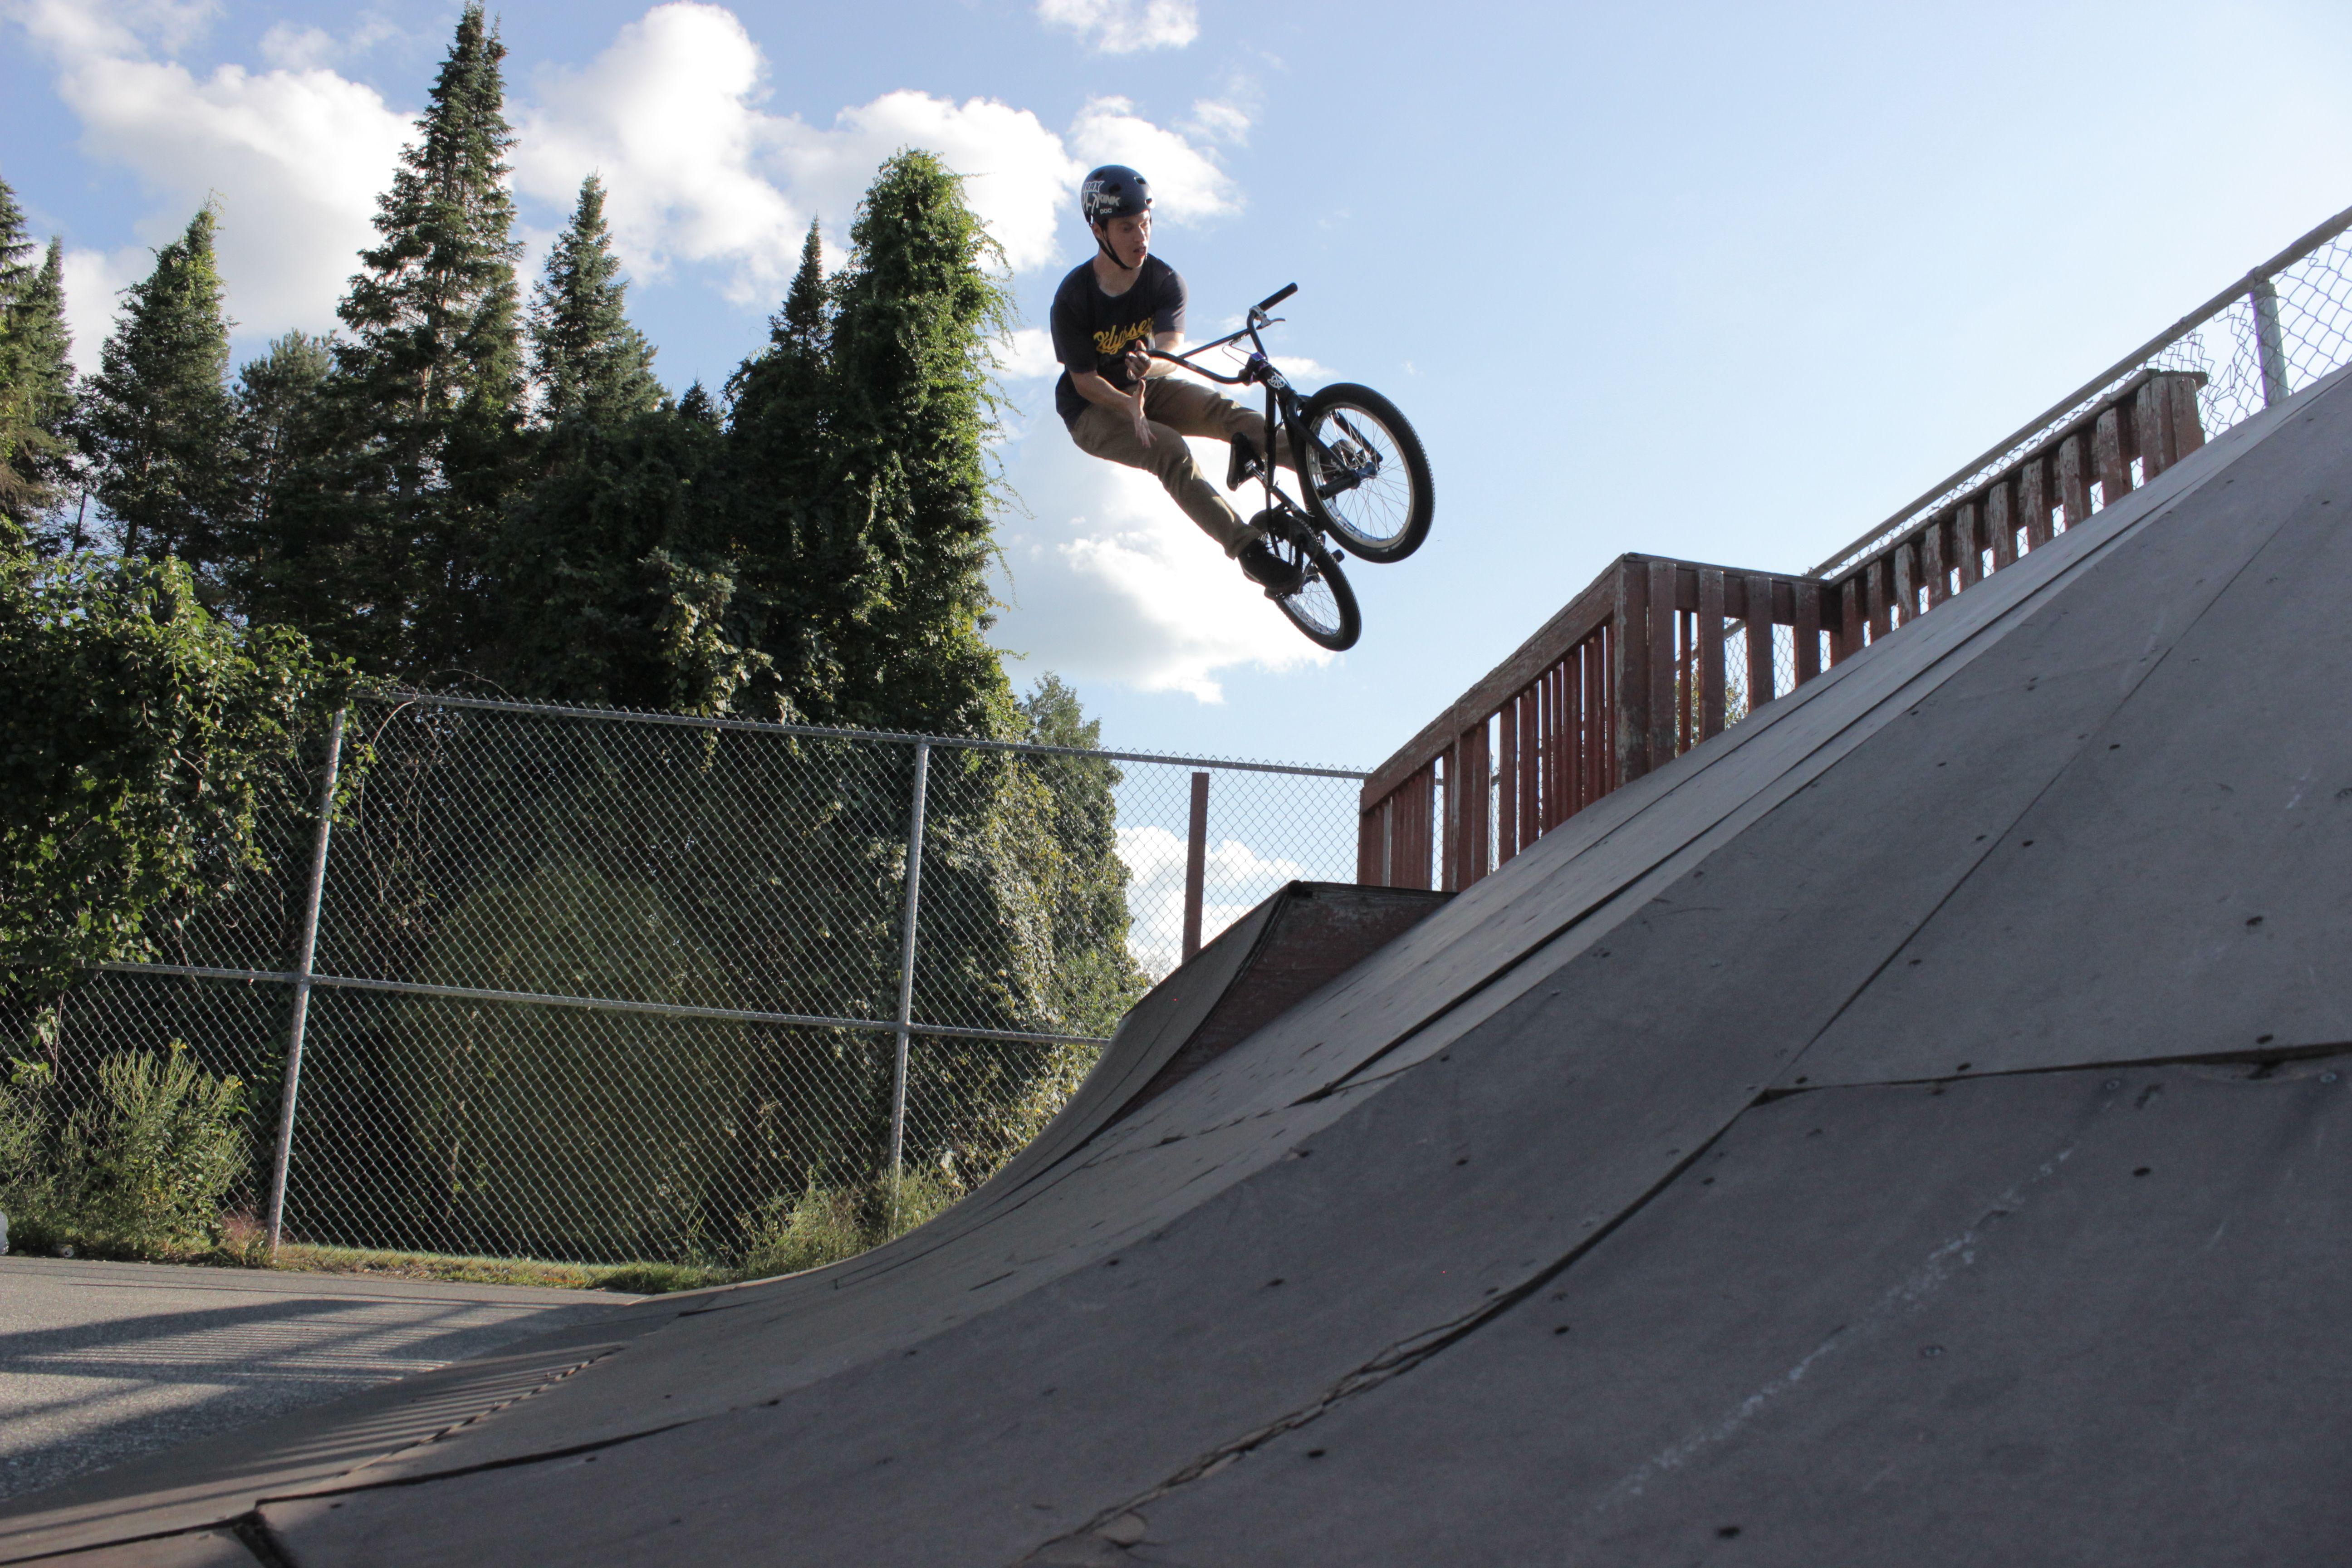 Neal Bachman Bar Air to Back Belchertown Skatepark